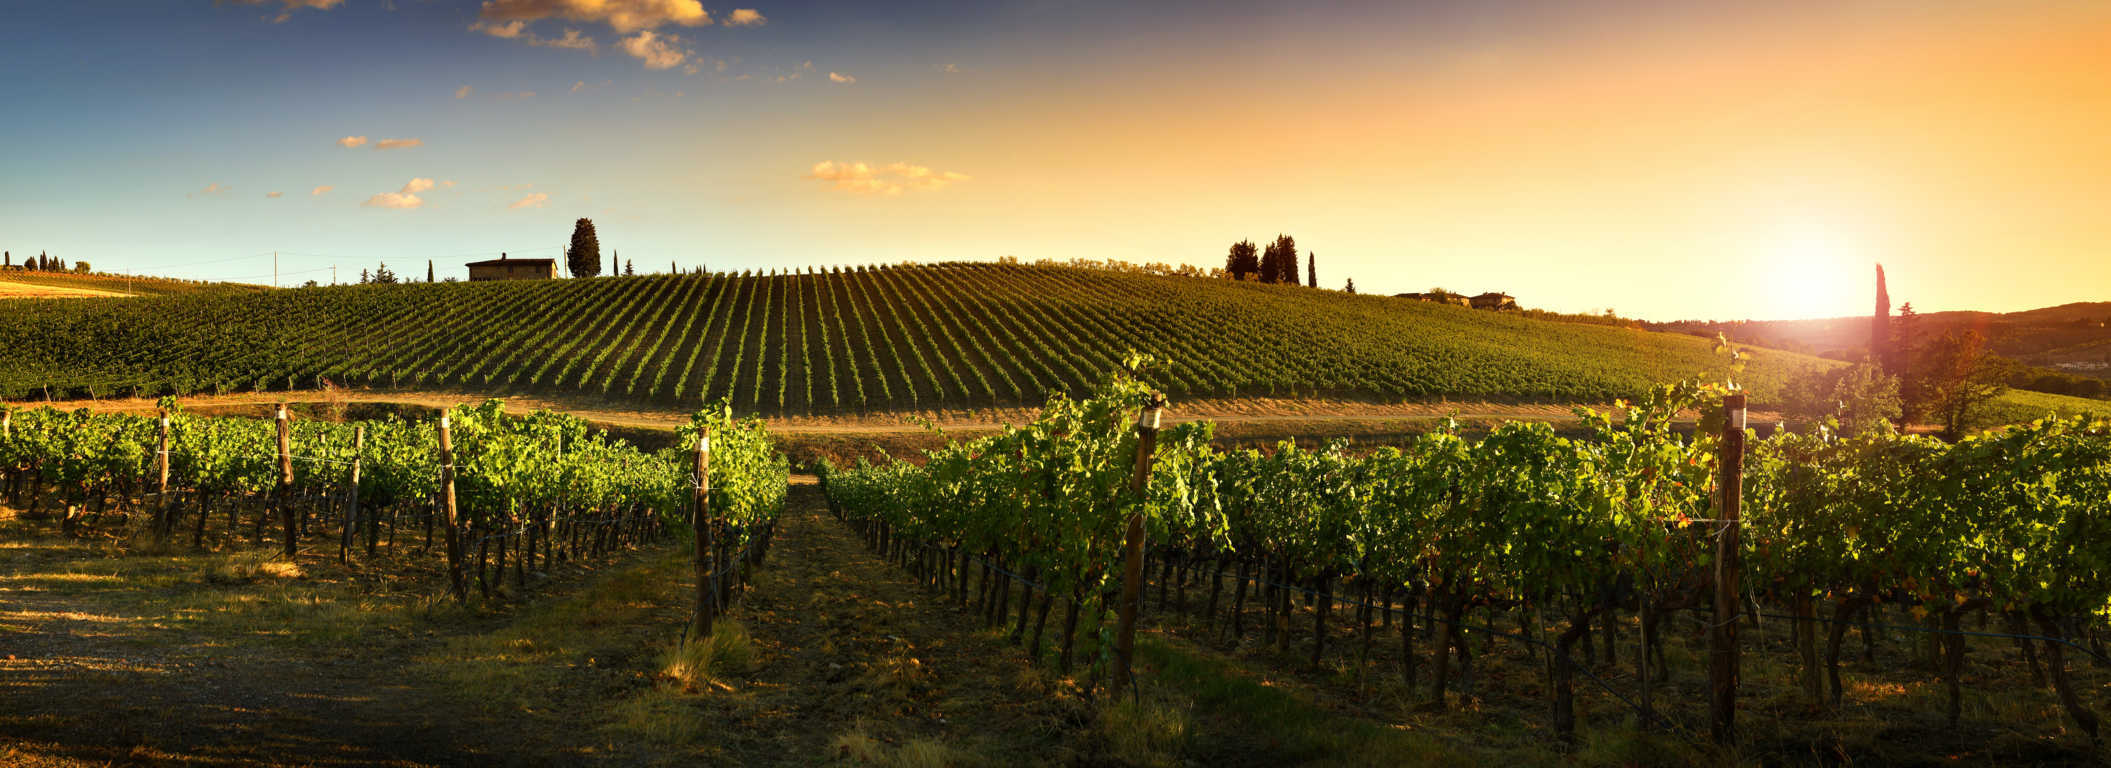 El vino se reinventa